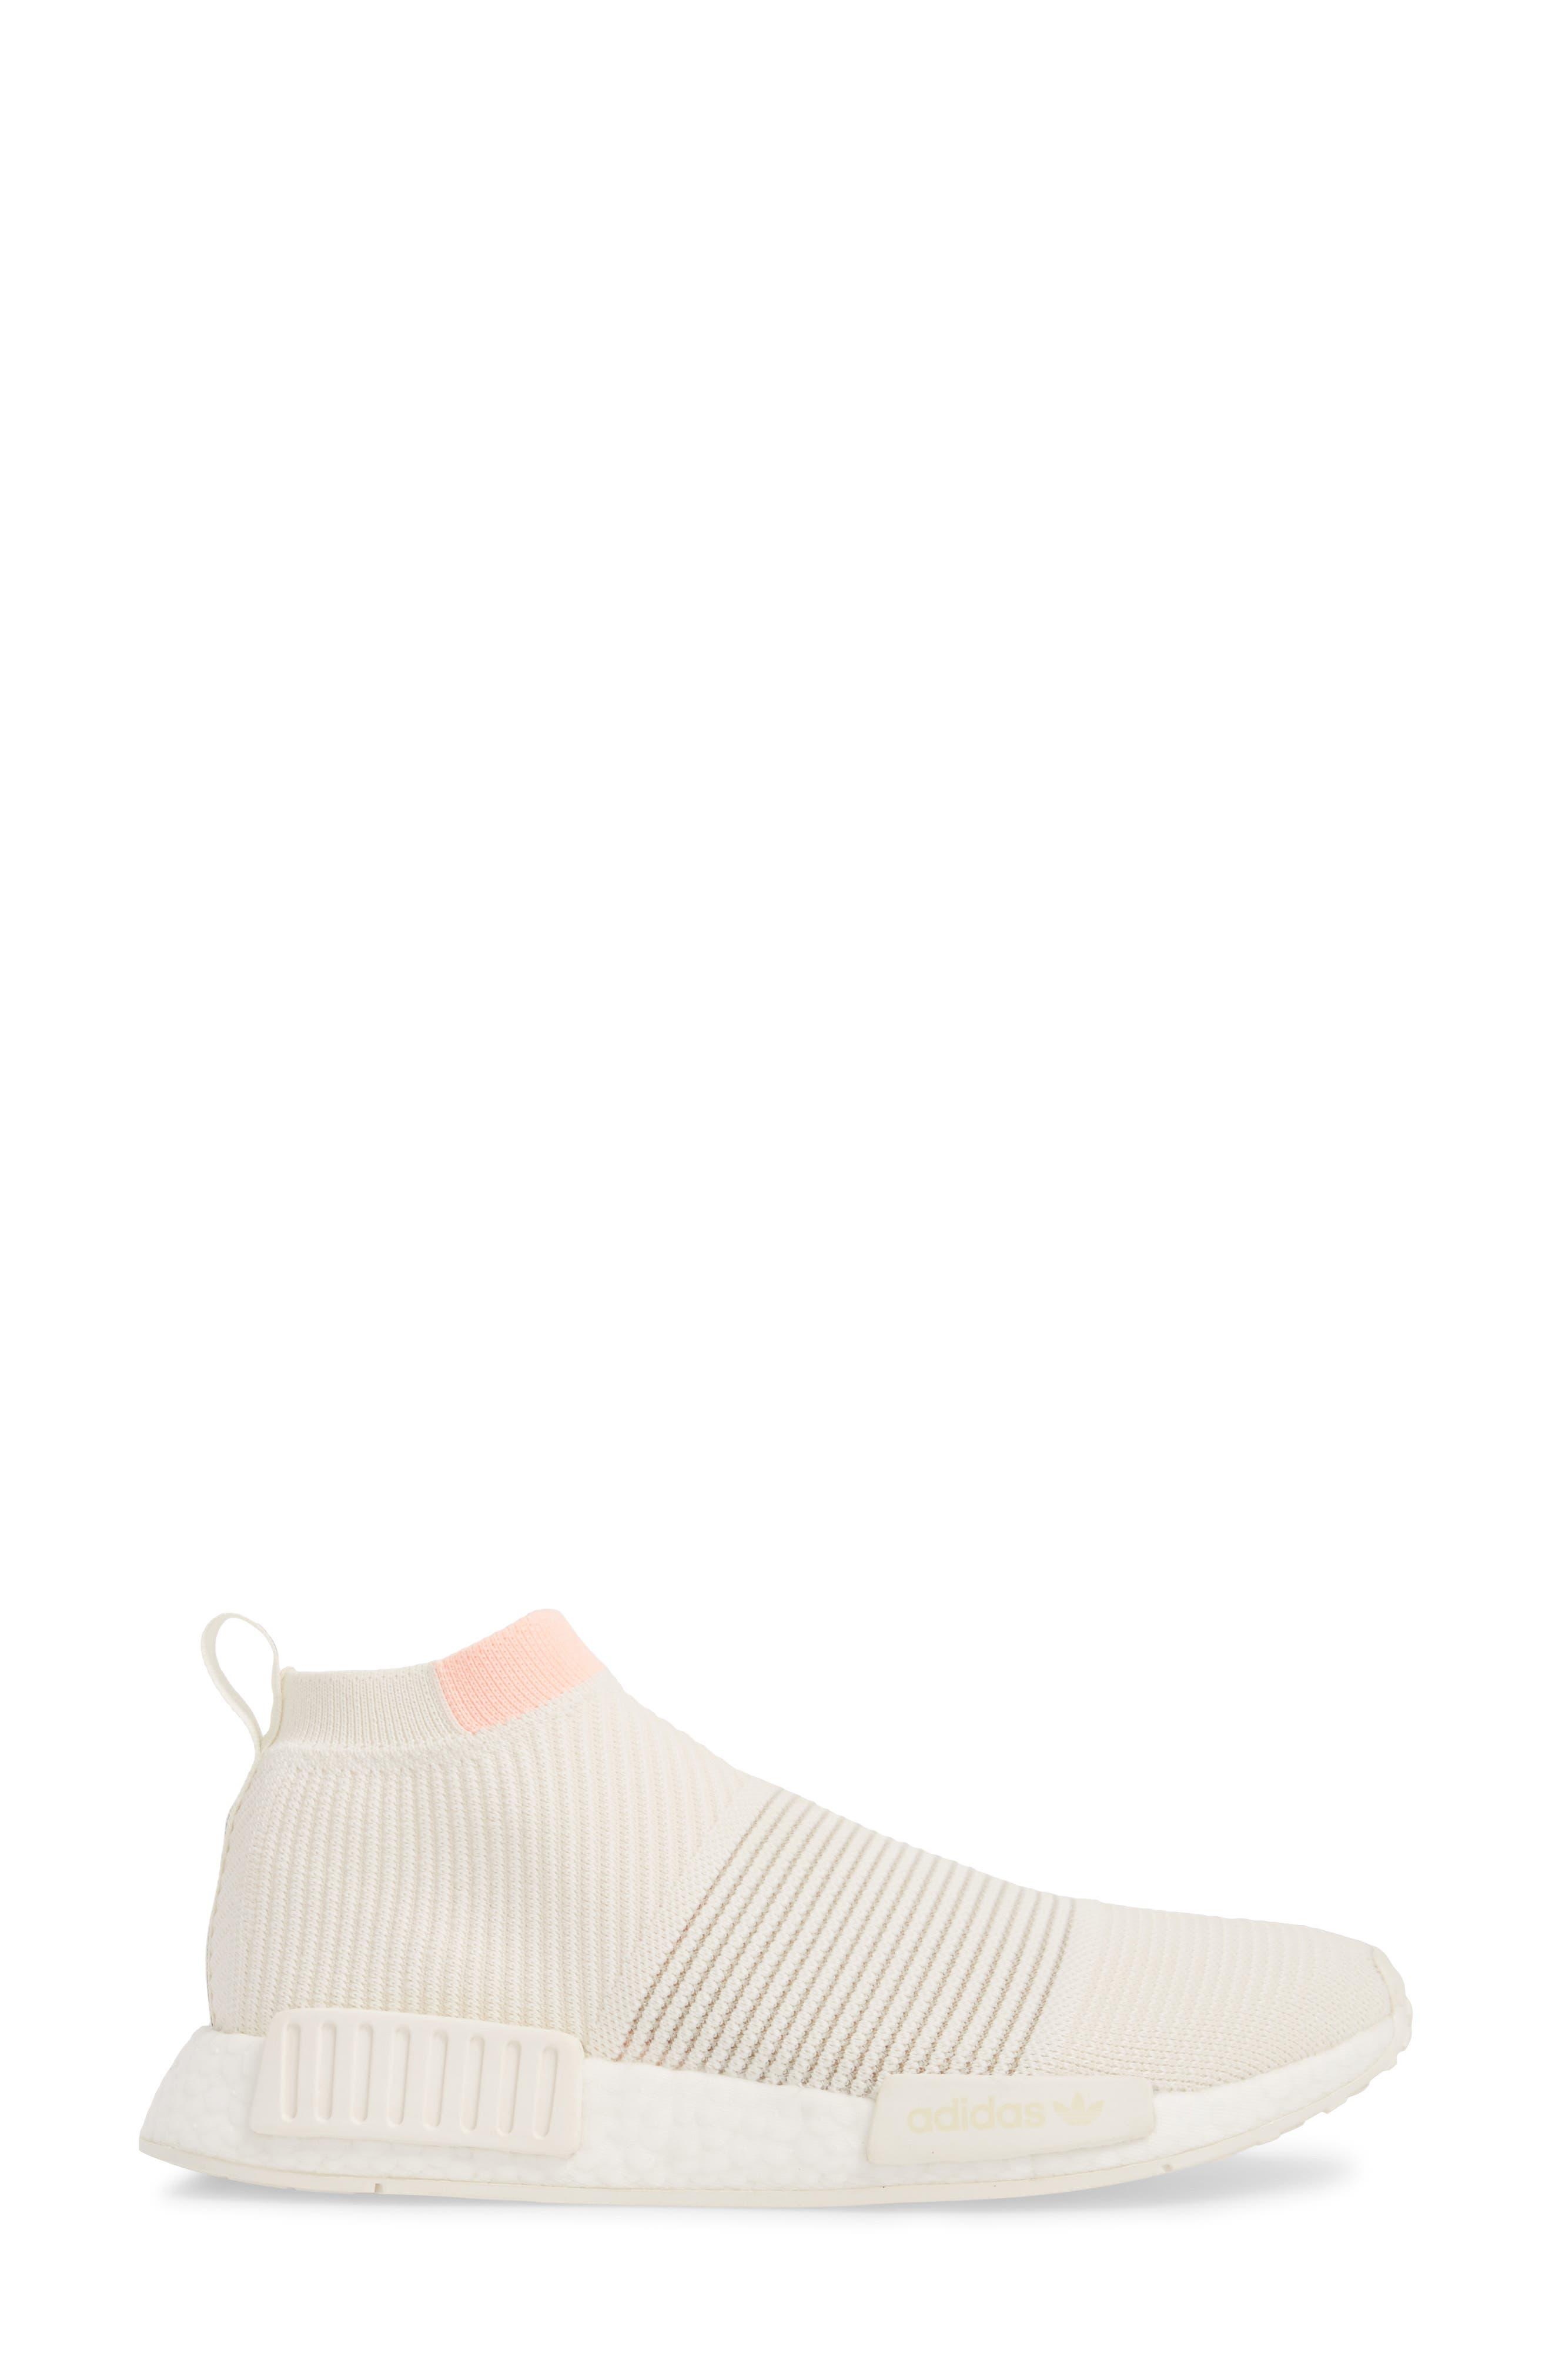 NMD_CS1 Primeknit Sneaker,                             Alternate thumbnail 3, color,                             CLOUD WHITE/ CLEAR ORANGE